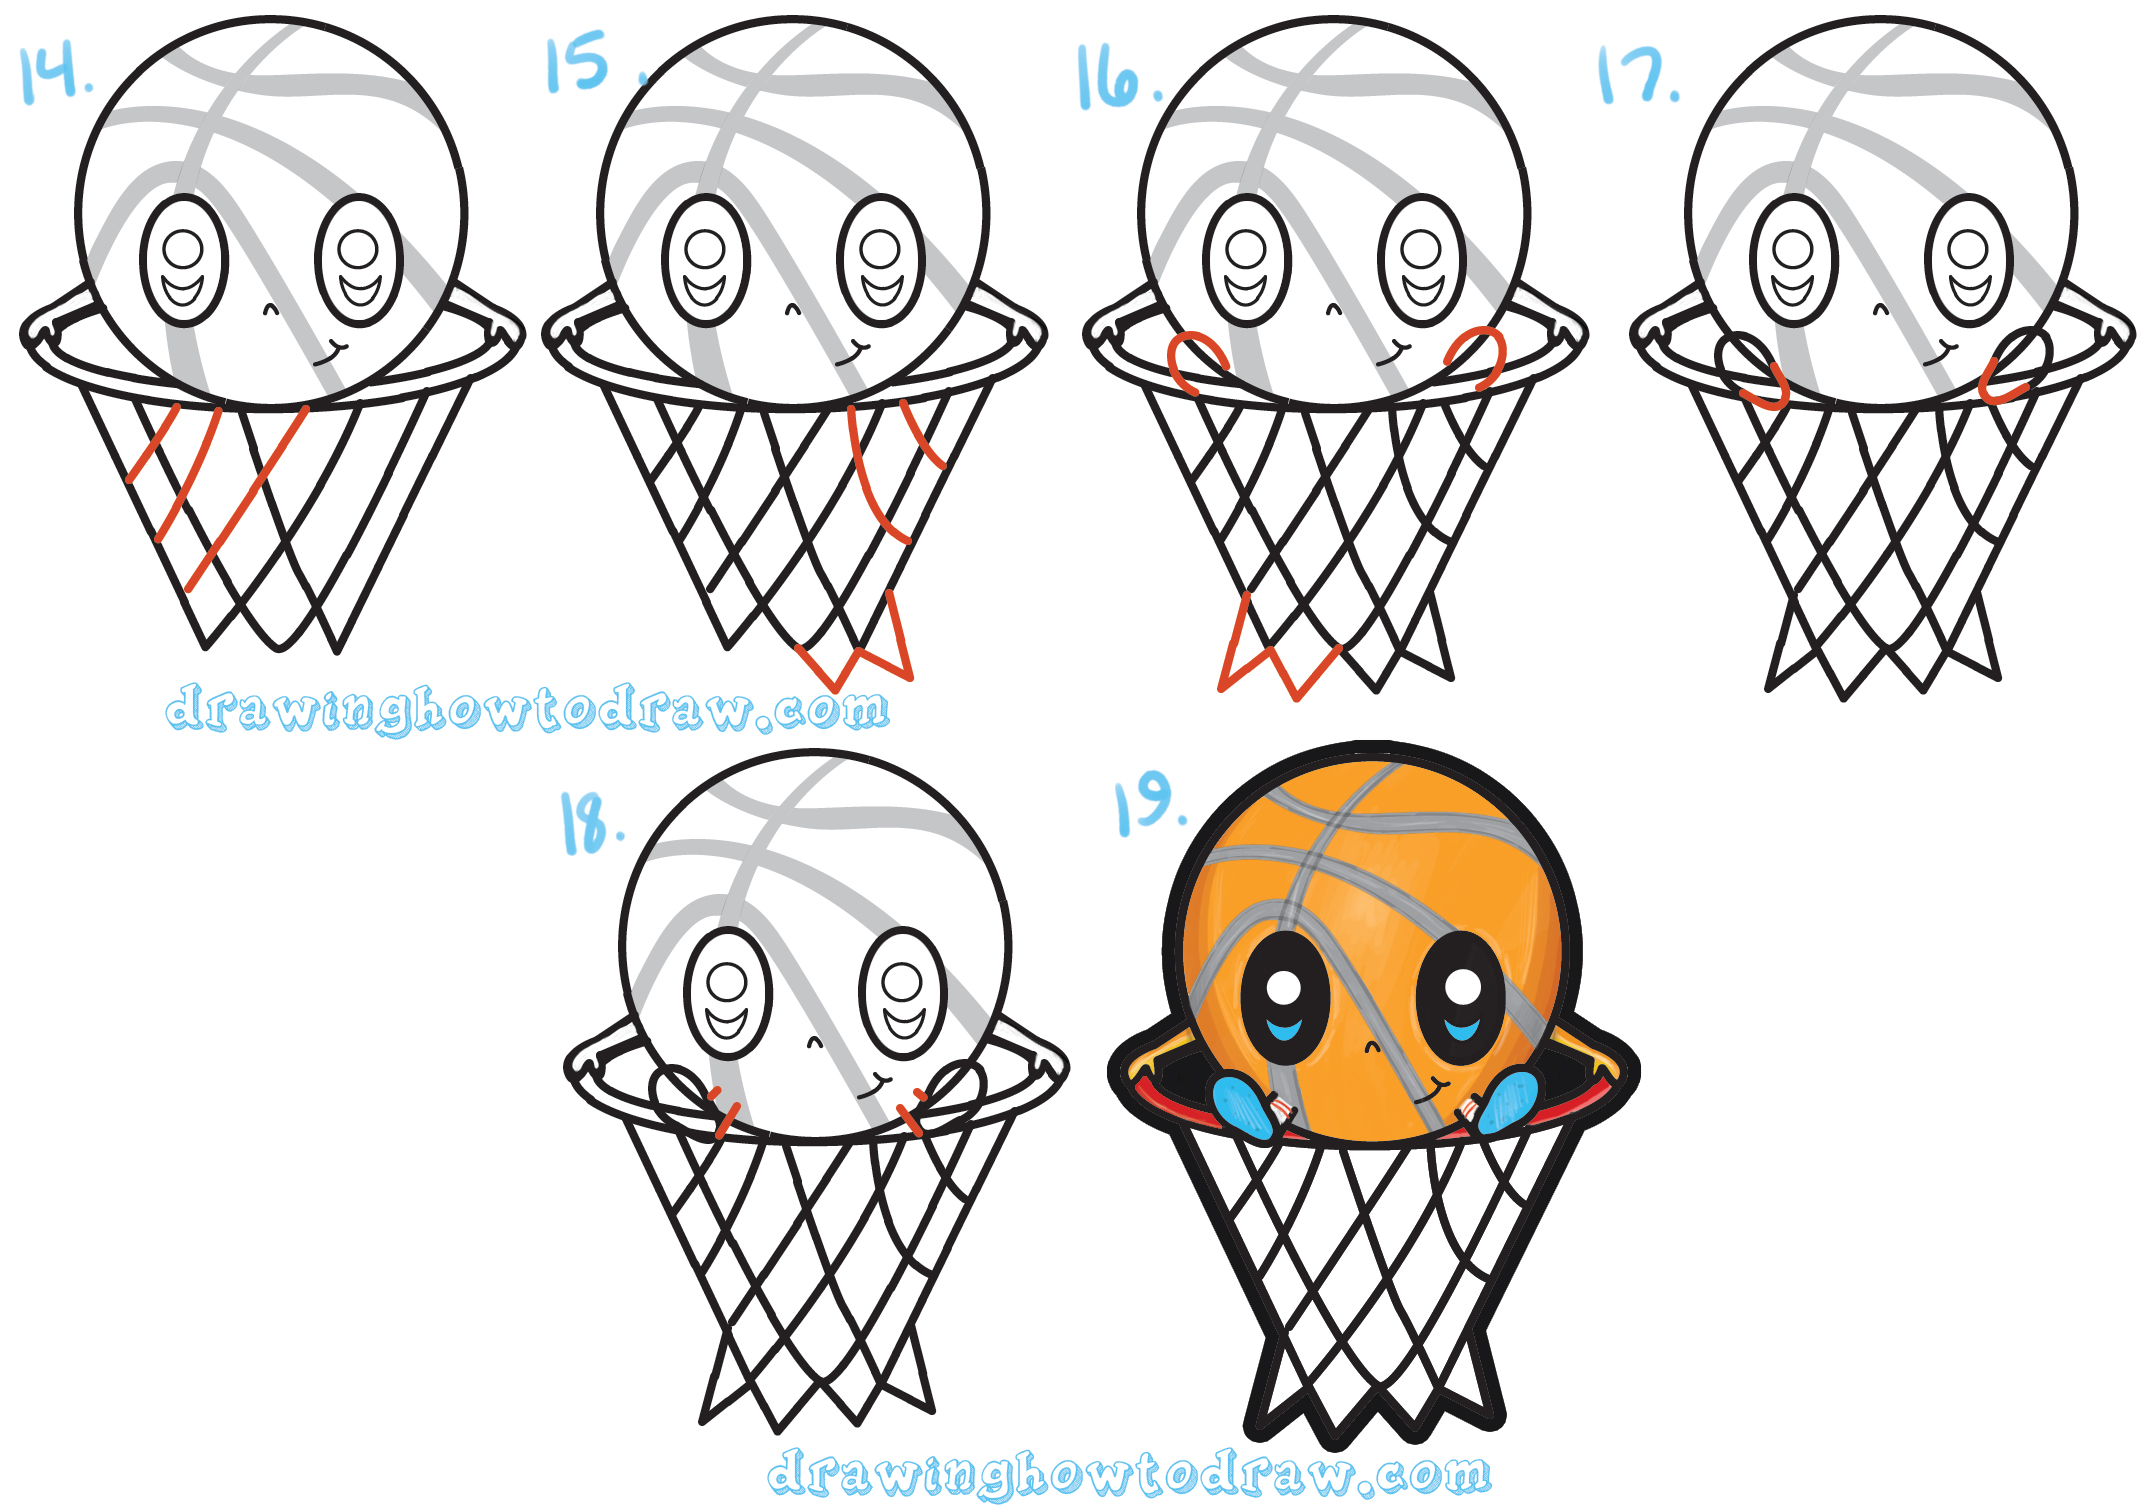 2143x1511 How To Draw A Cartoon Basketball Guy (Cute Kawaii Chibi Style)